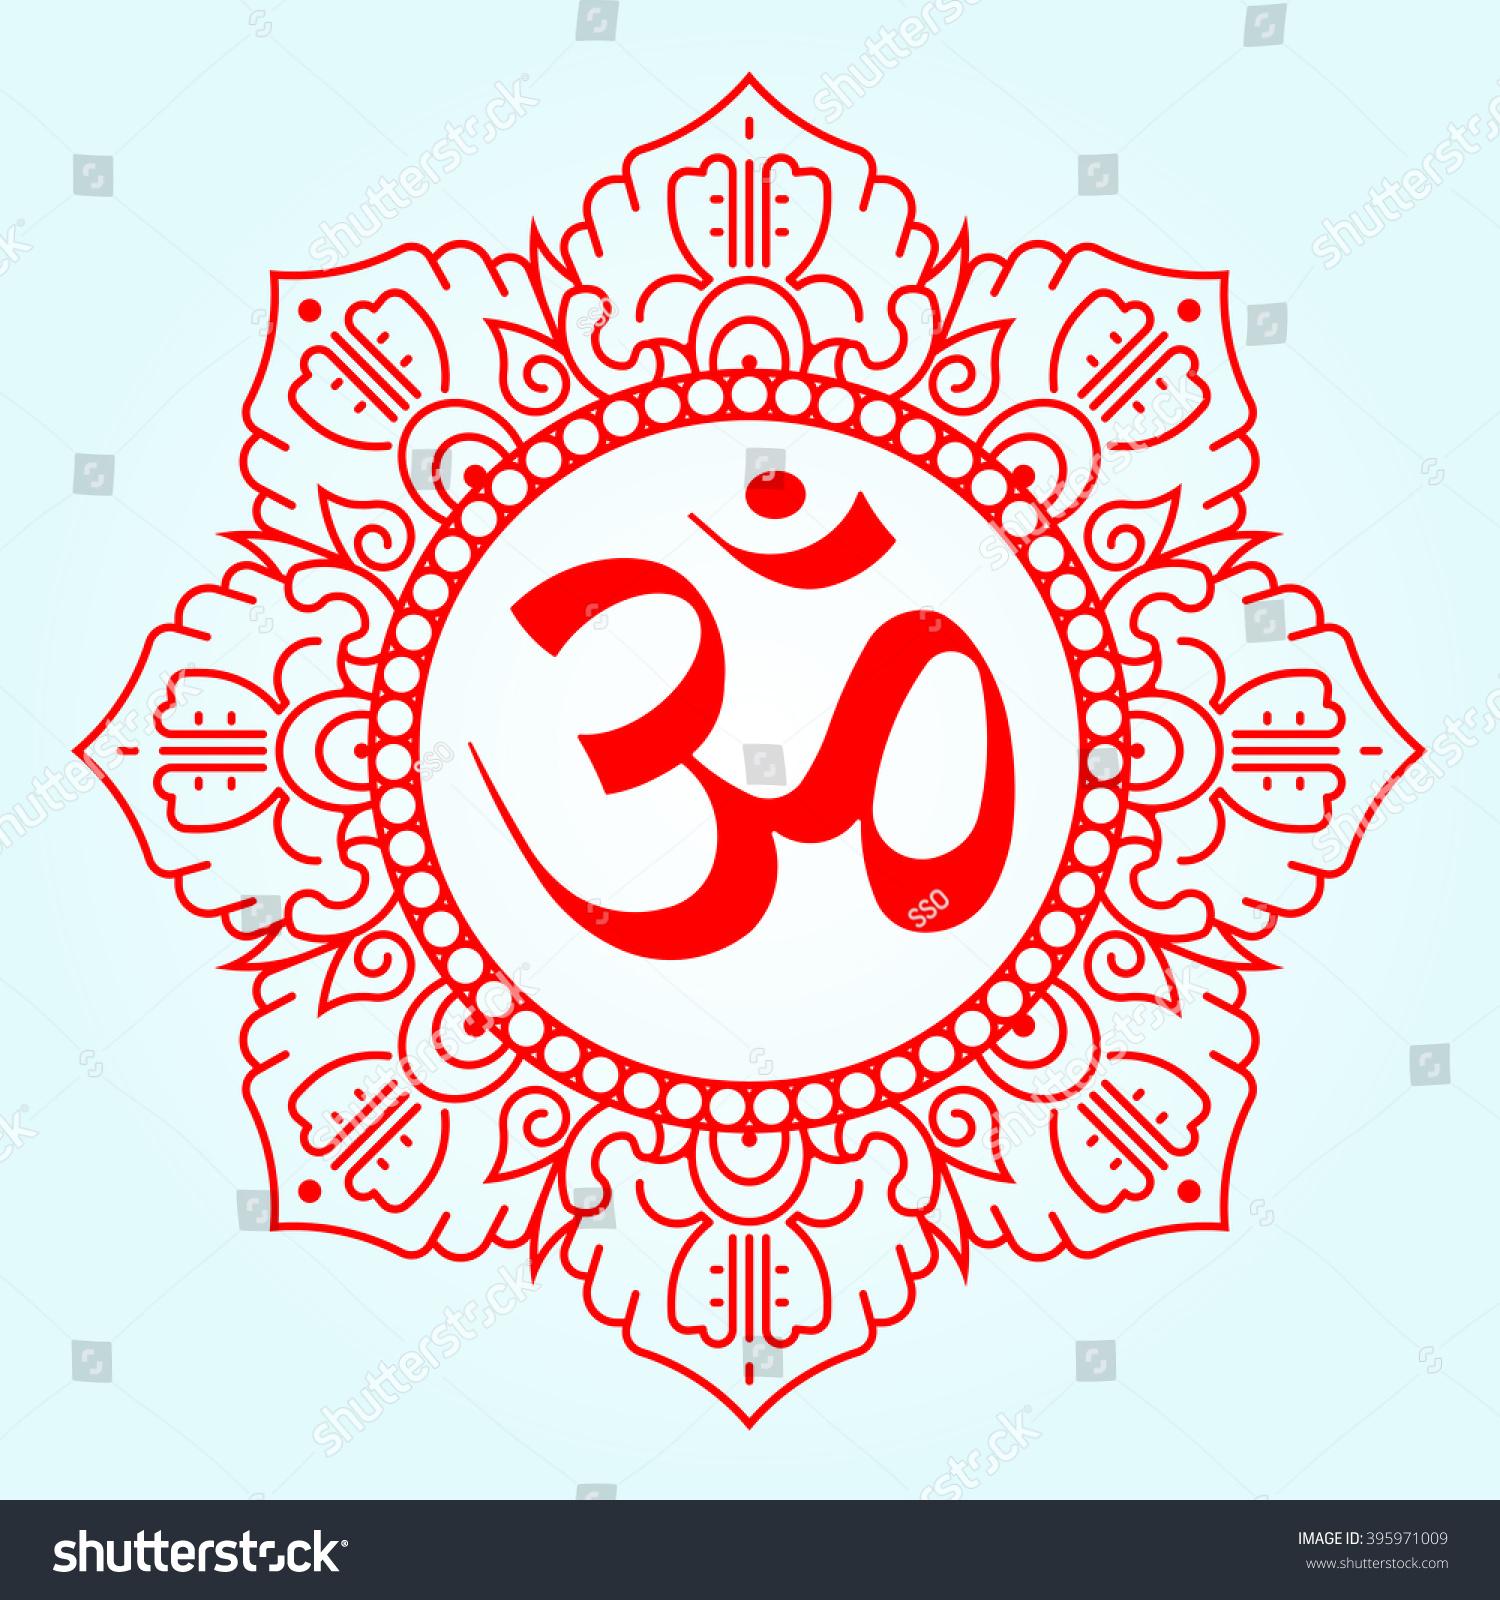 Hindu religious symbols vector ma hindu religious symbols vector biocorpaavc